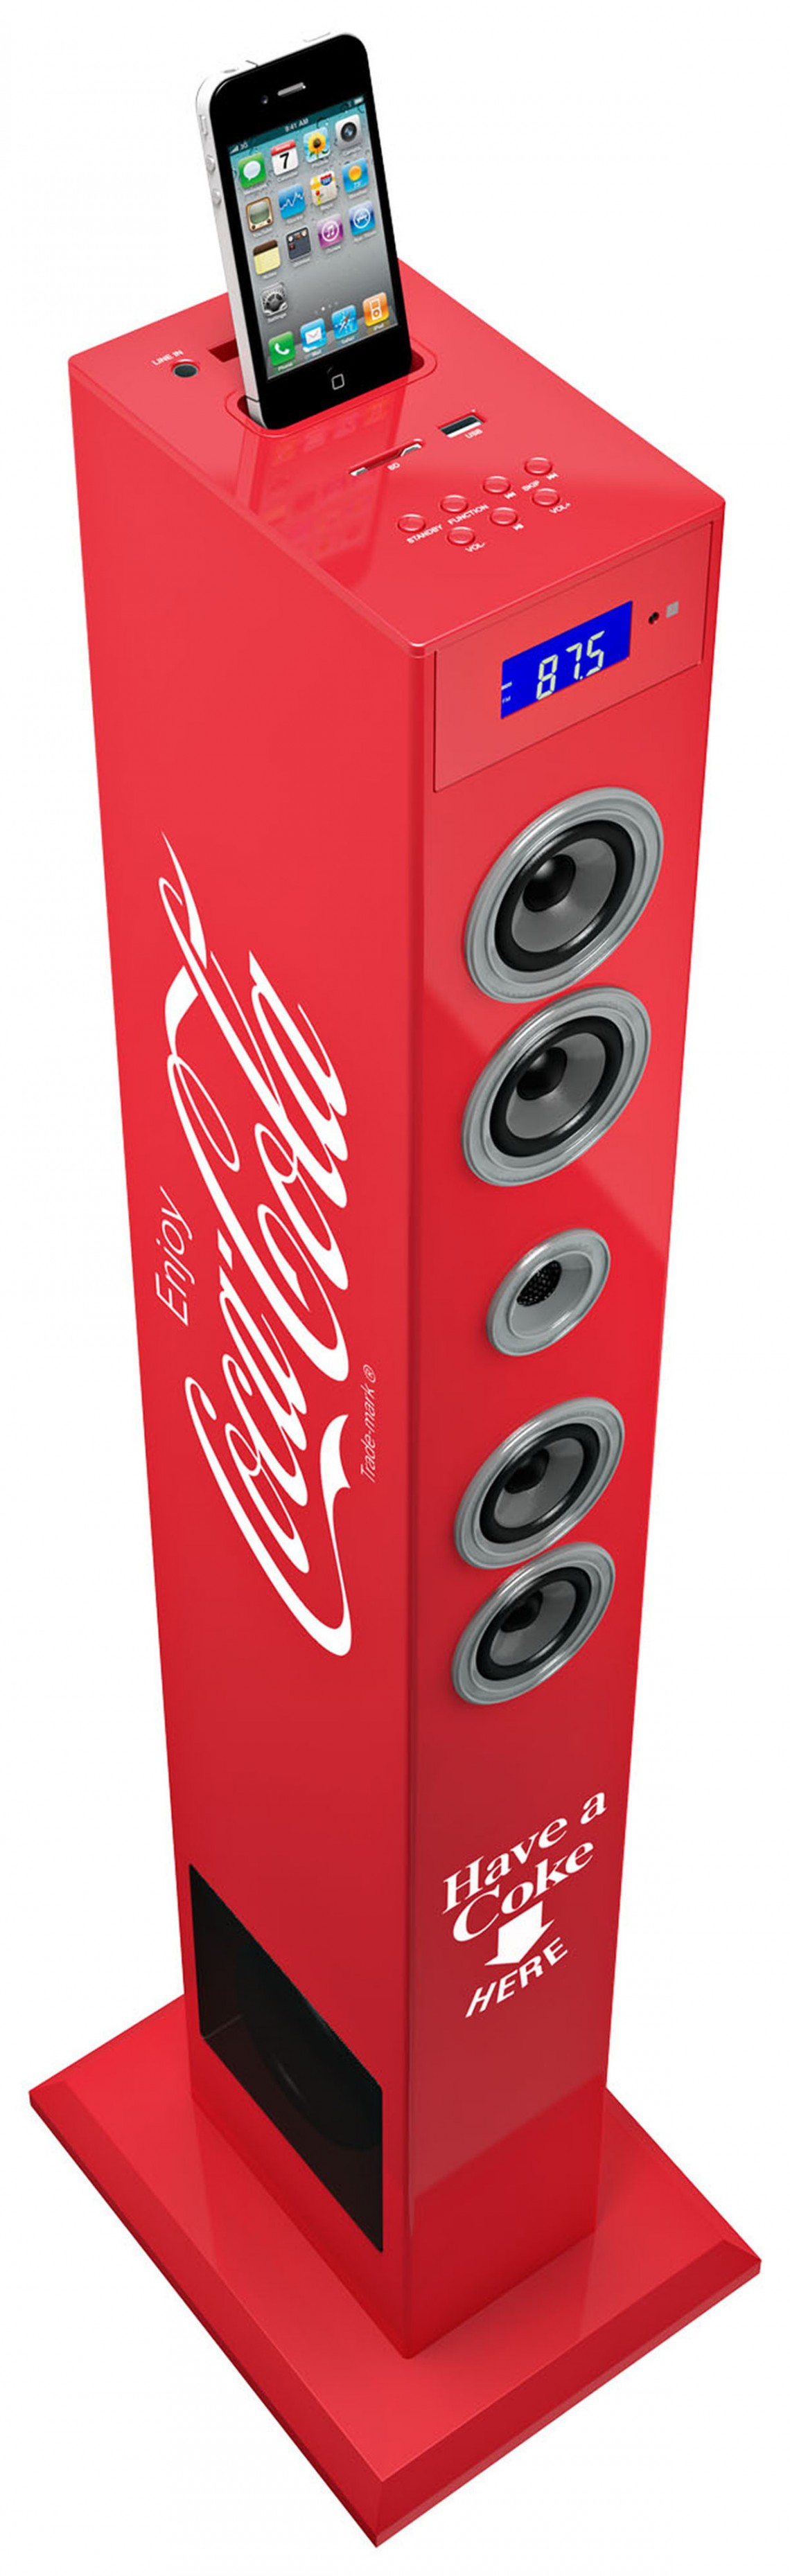 Torre Multimediale plug & play COCA-COLA - Immagine #10